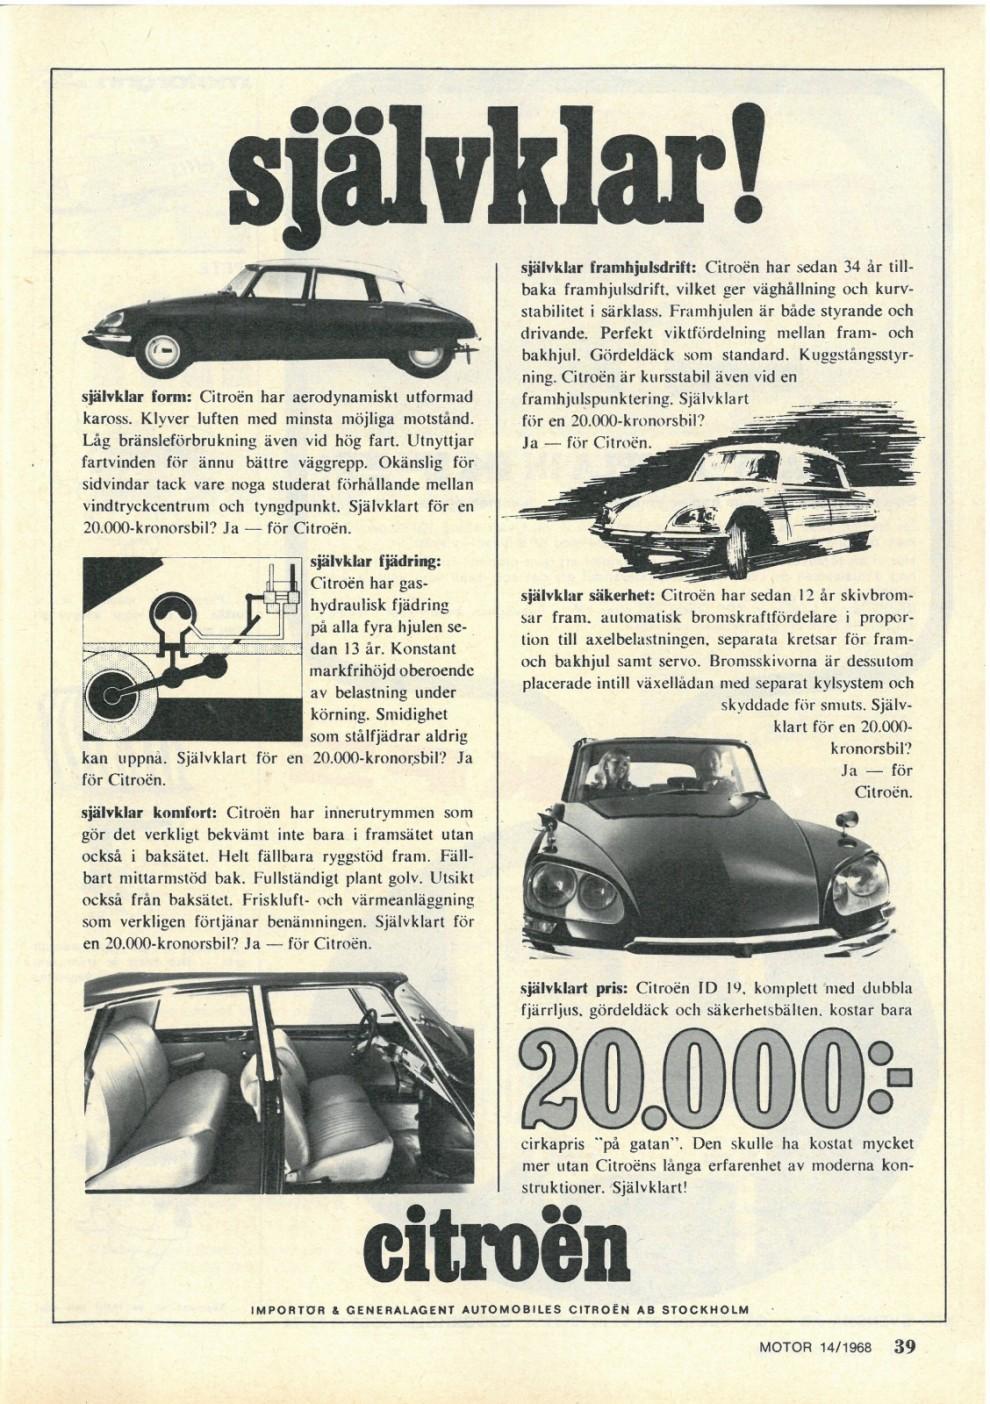 Citroën 1968